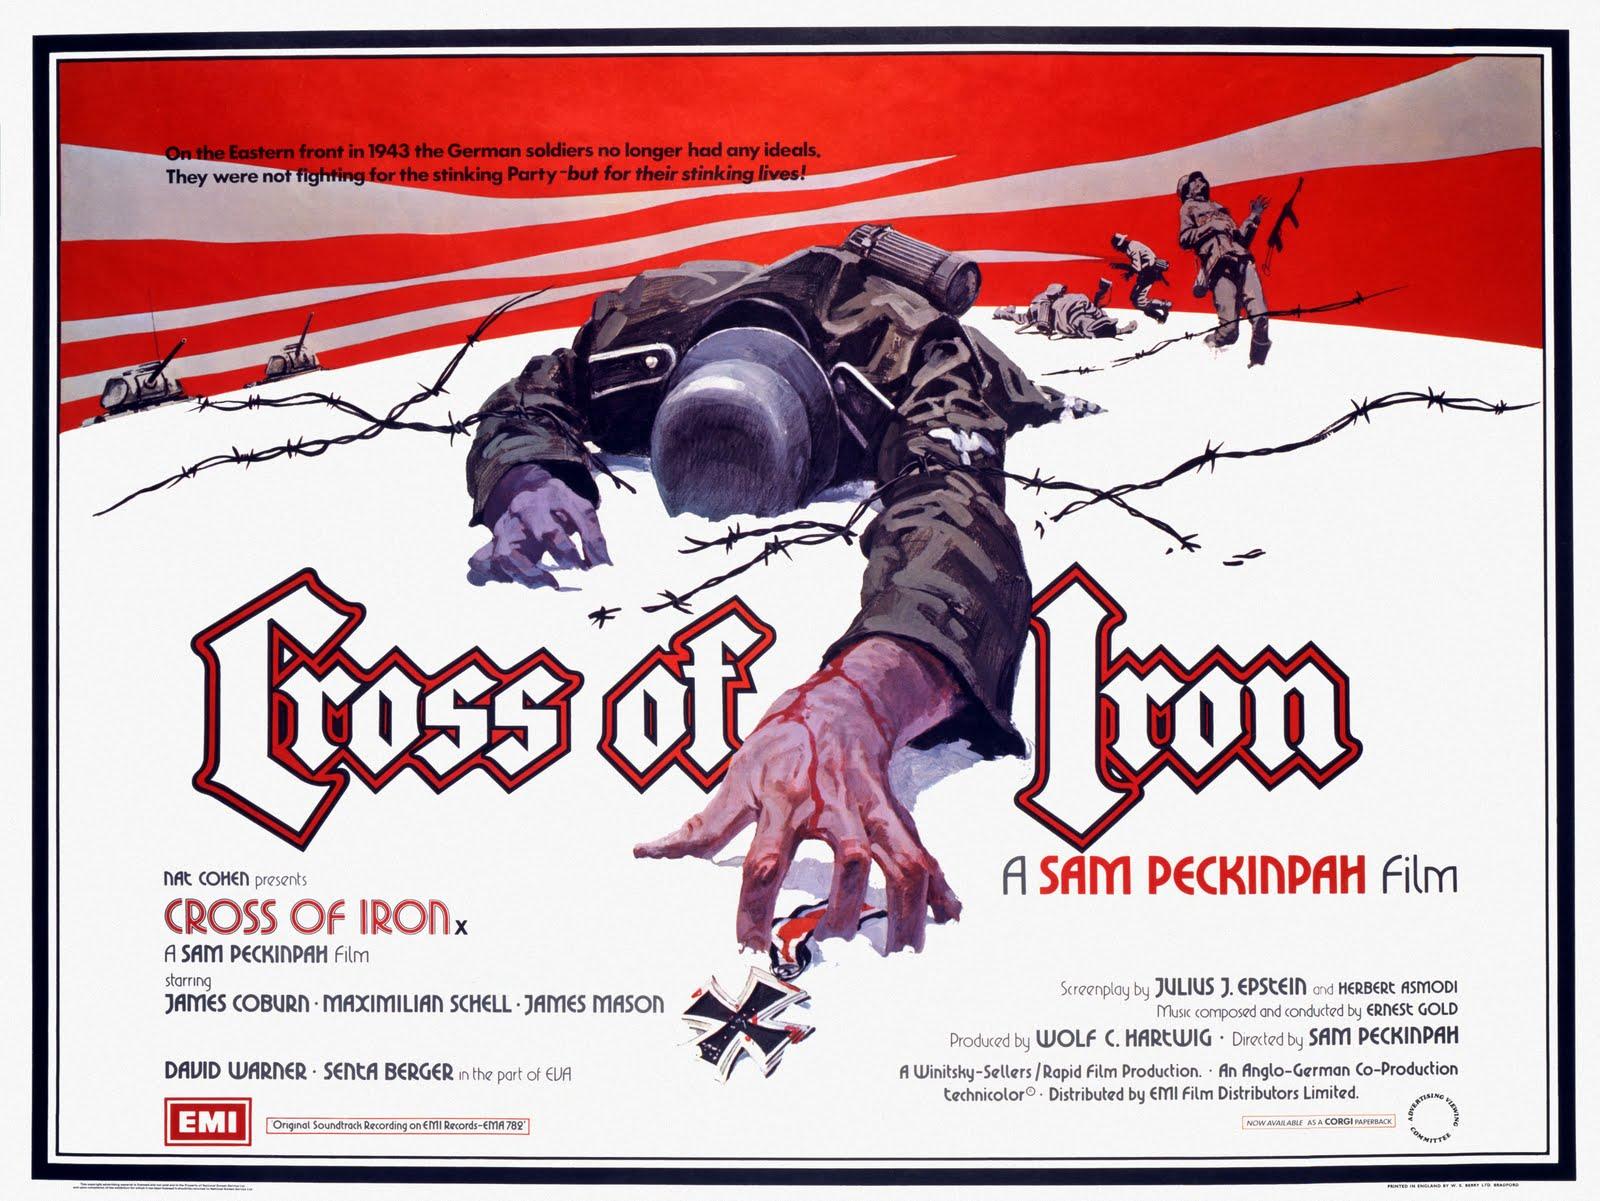 Si tuvieses que elegir tu película preferida de Sam Peckinpah Cross+of+Iron-1